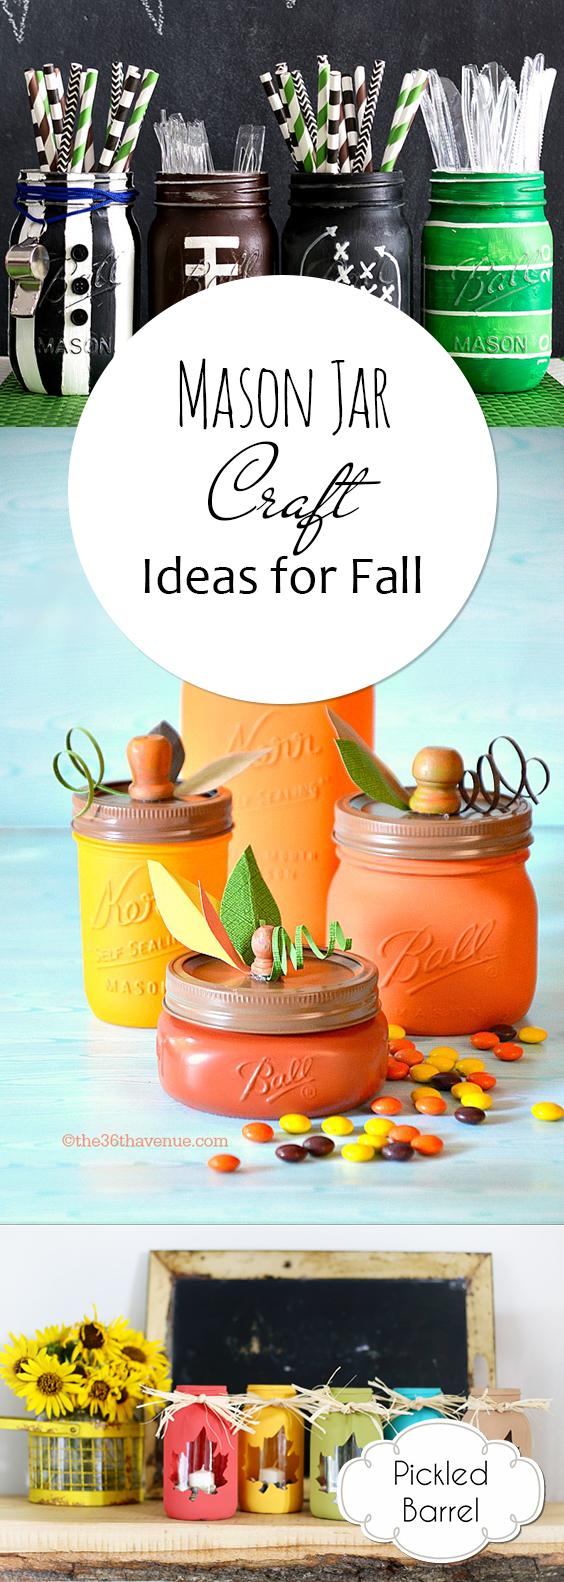 Mason Jar Crafts, Mason Jar Crafts for Fall, Fun Crafts for Fall, Fun Fall Crafts, Mason Jar Craft Projects, Fall Craft Projects, Fall DIYs, Fall DIY Projects, Popular Pin, Holiday Crafts